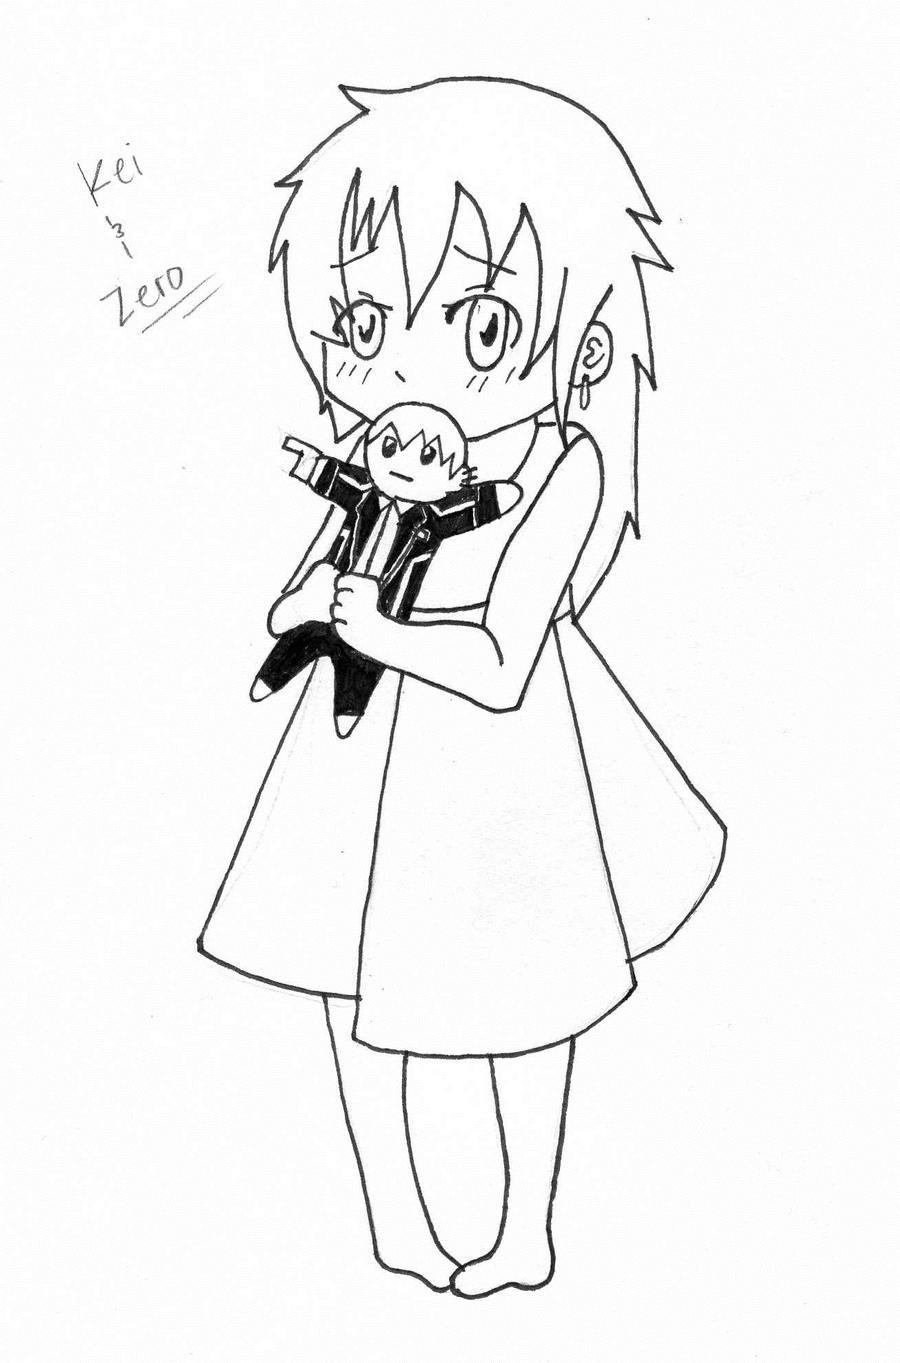 Line Art Zero : Kei line art zero doll by s alaina on deviantart